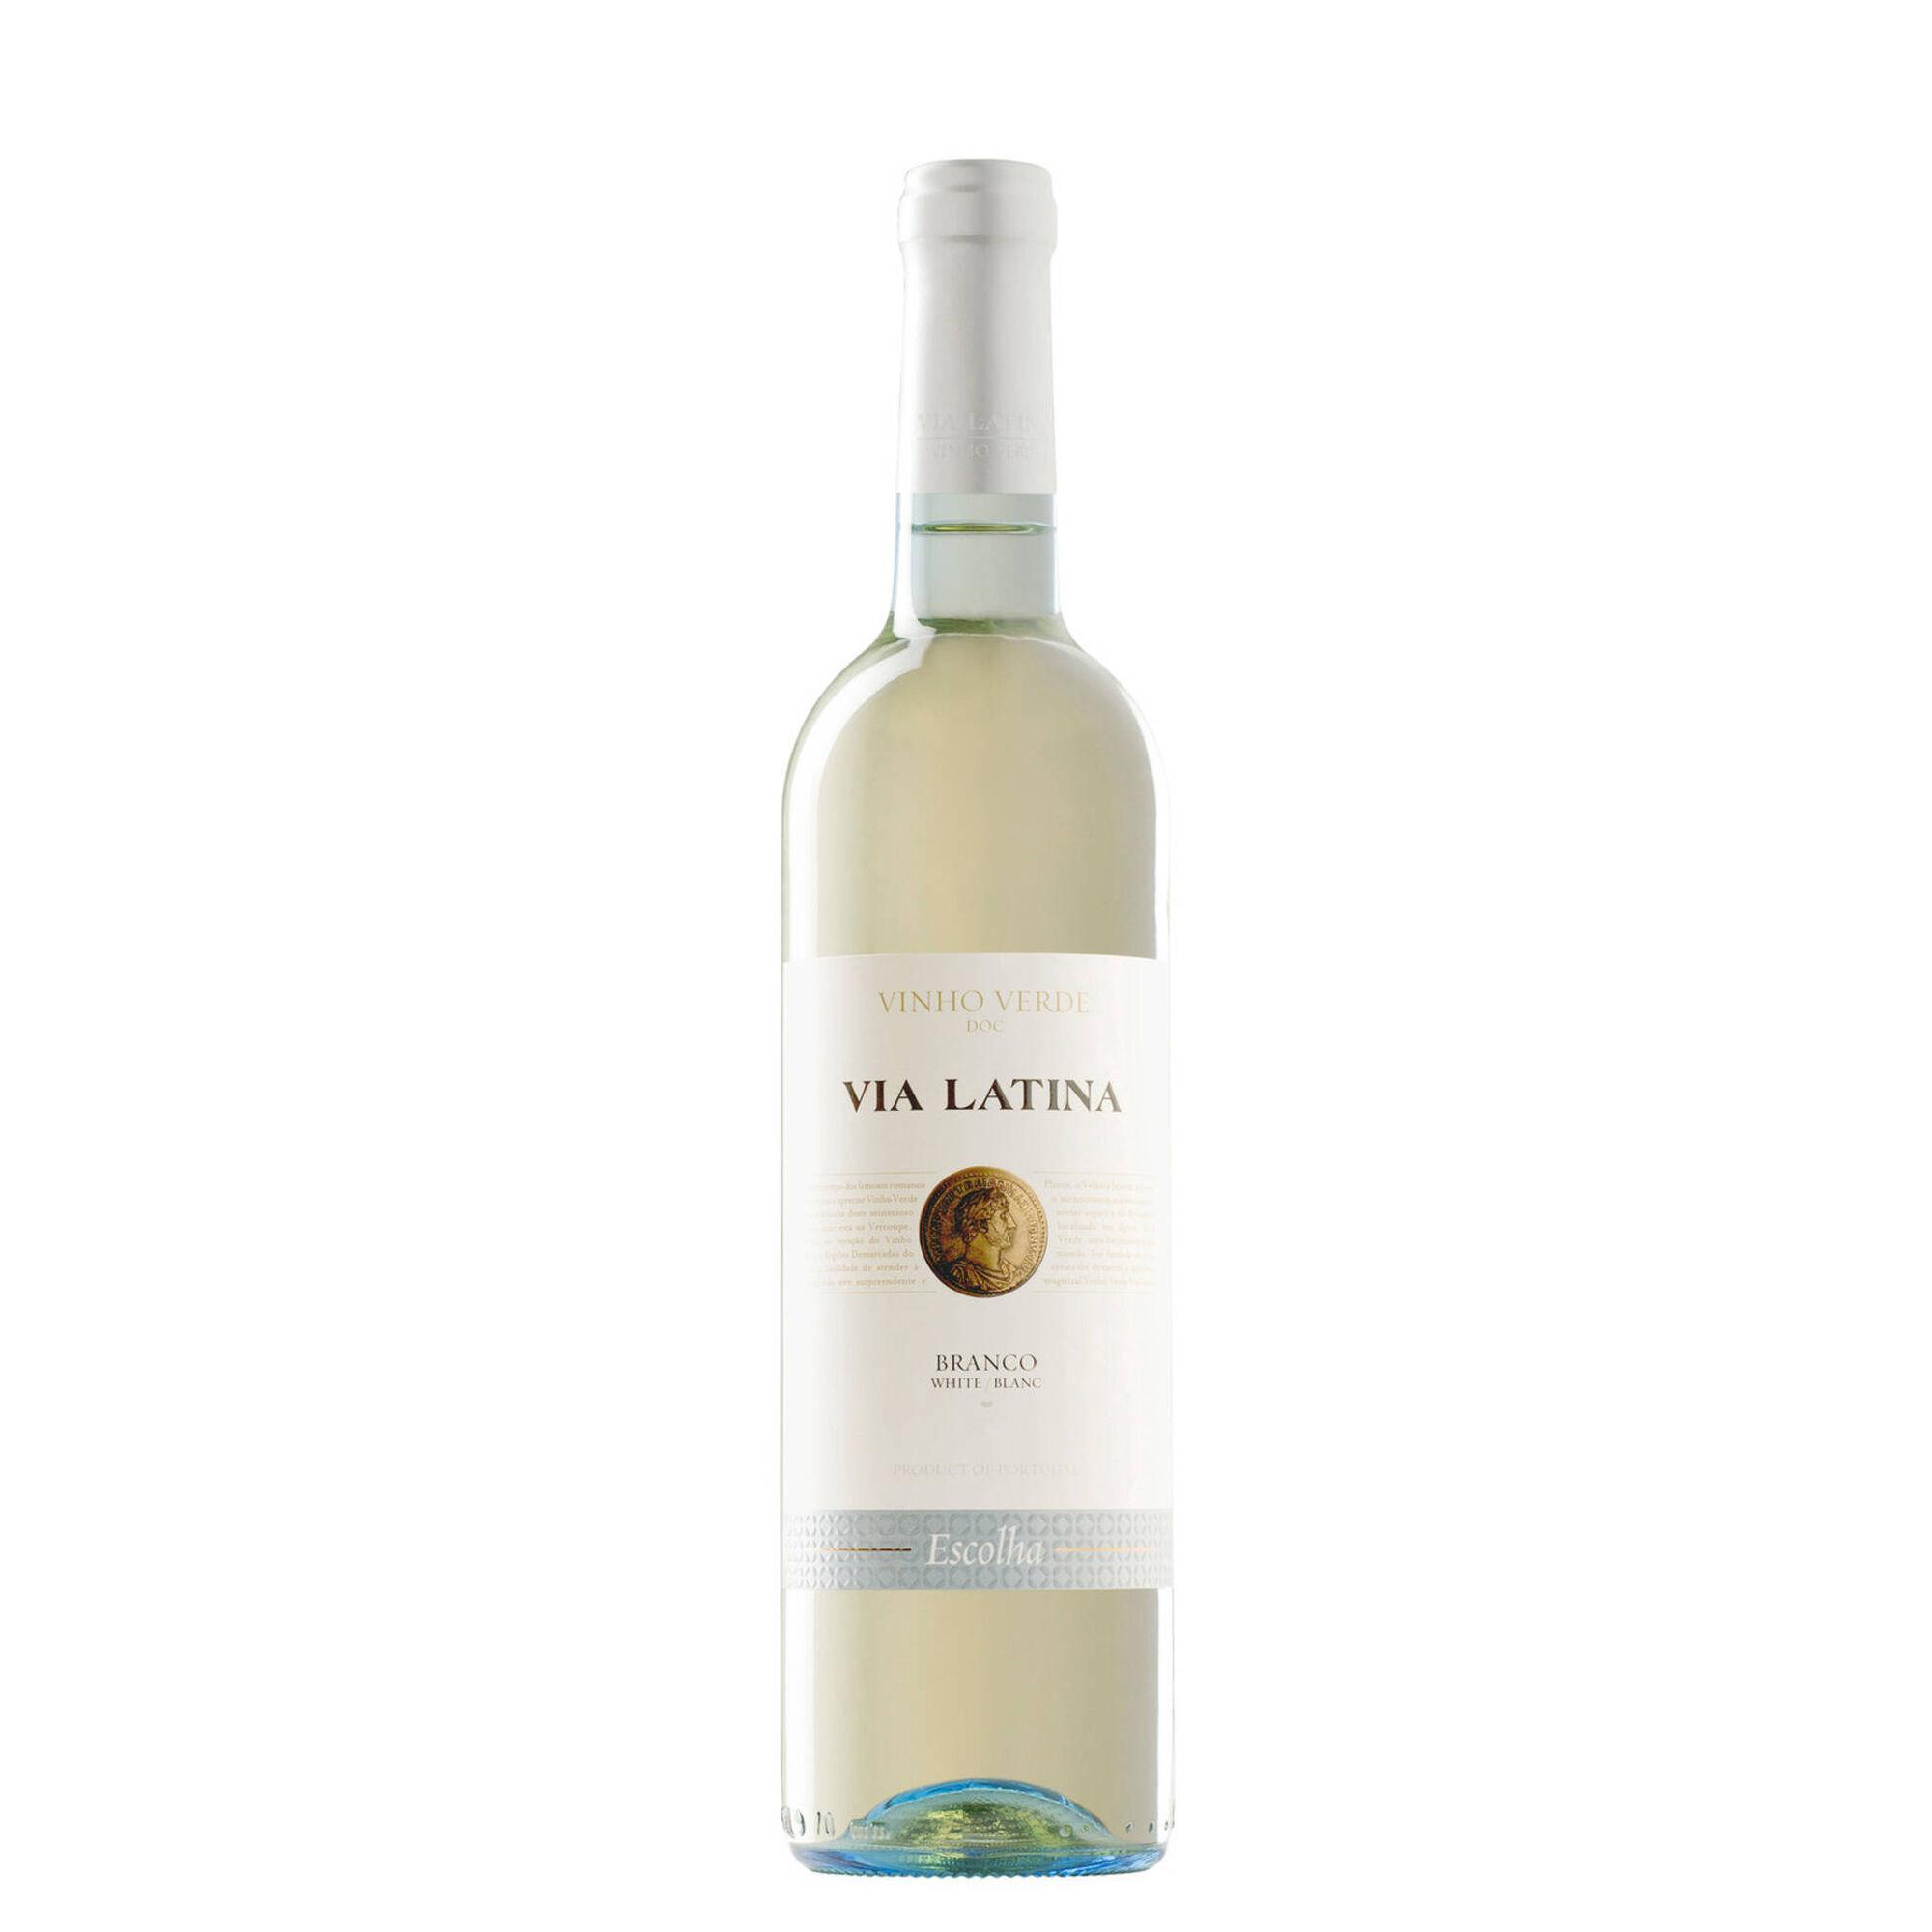 Via Latina DOC Vinho Verde Branco